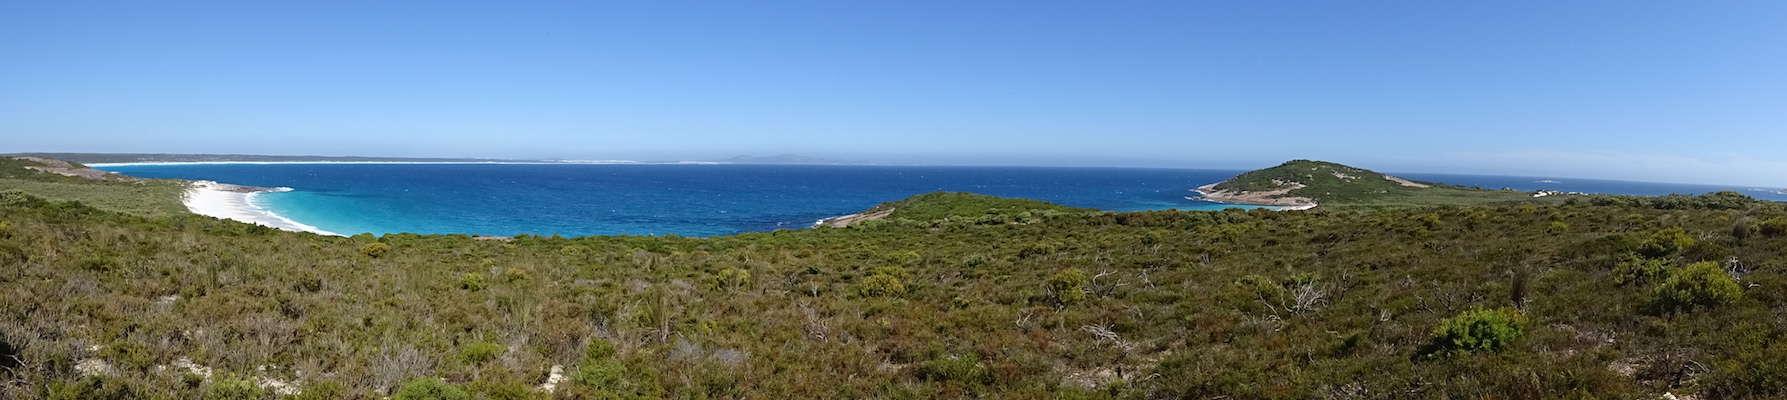 Cape Arid National Park 01